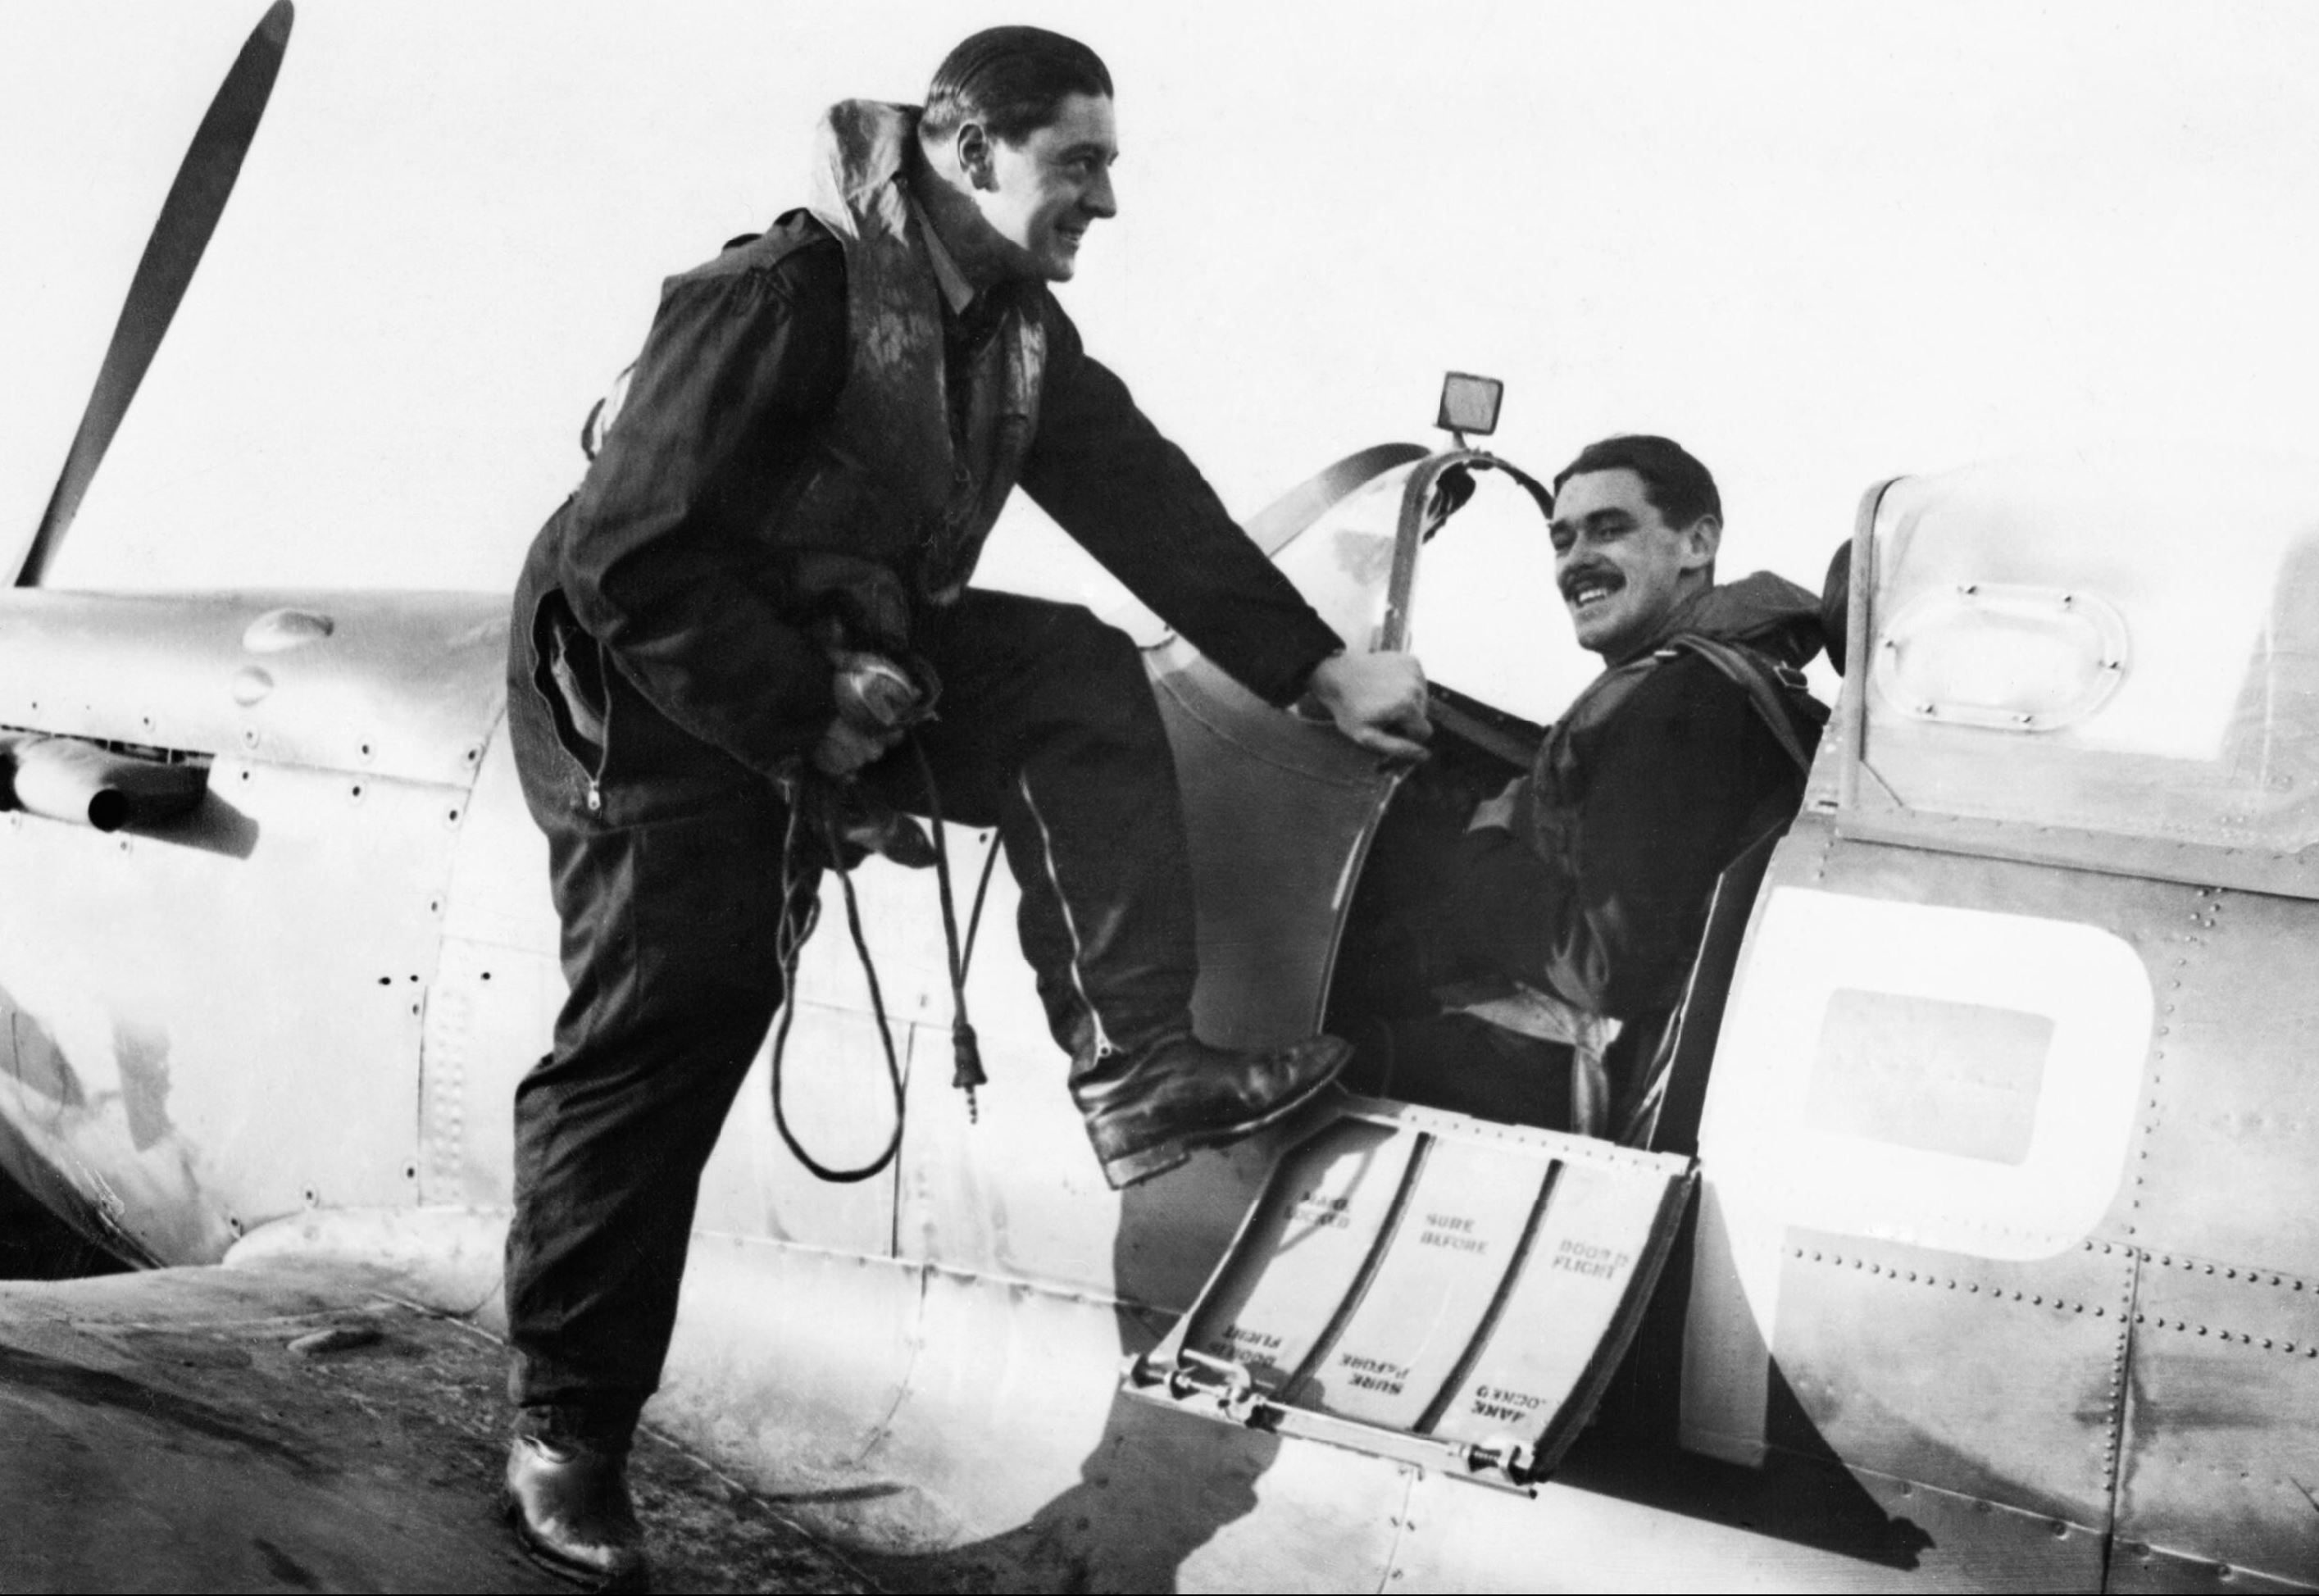 Spitfire RAF 74Sqn HM Stephen n John Mungo Park at Biggin Hill 30 Nov 1940 IWM HU73463